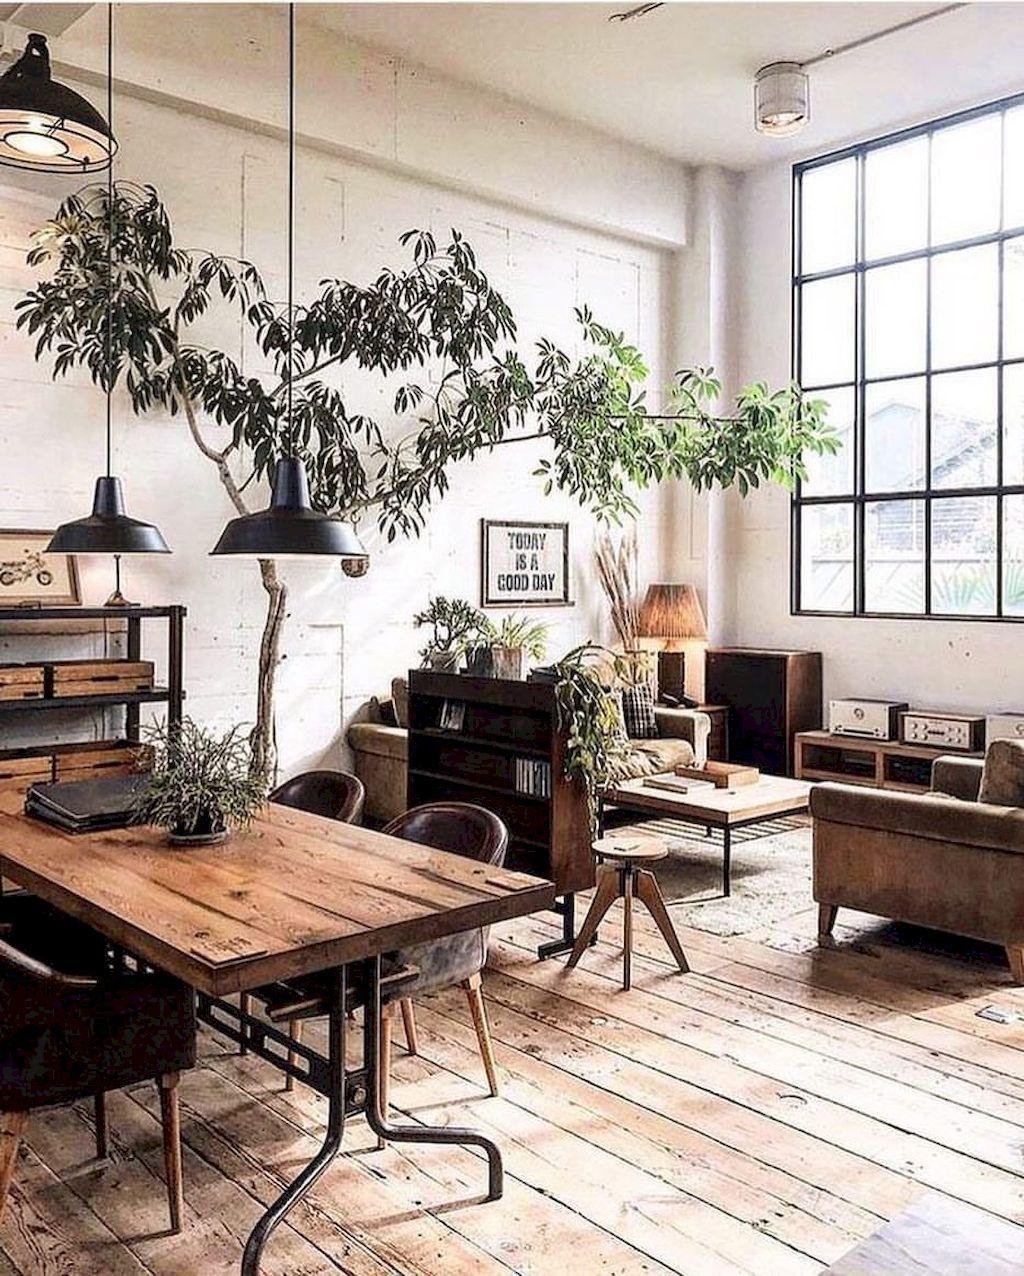 75 Cozy Modern Farmhouse Living Room Decor Ideas images